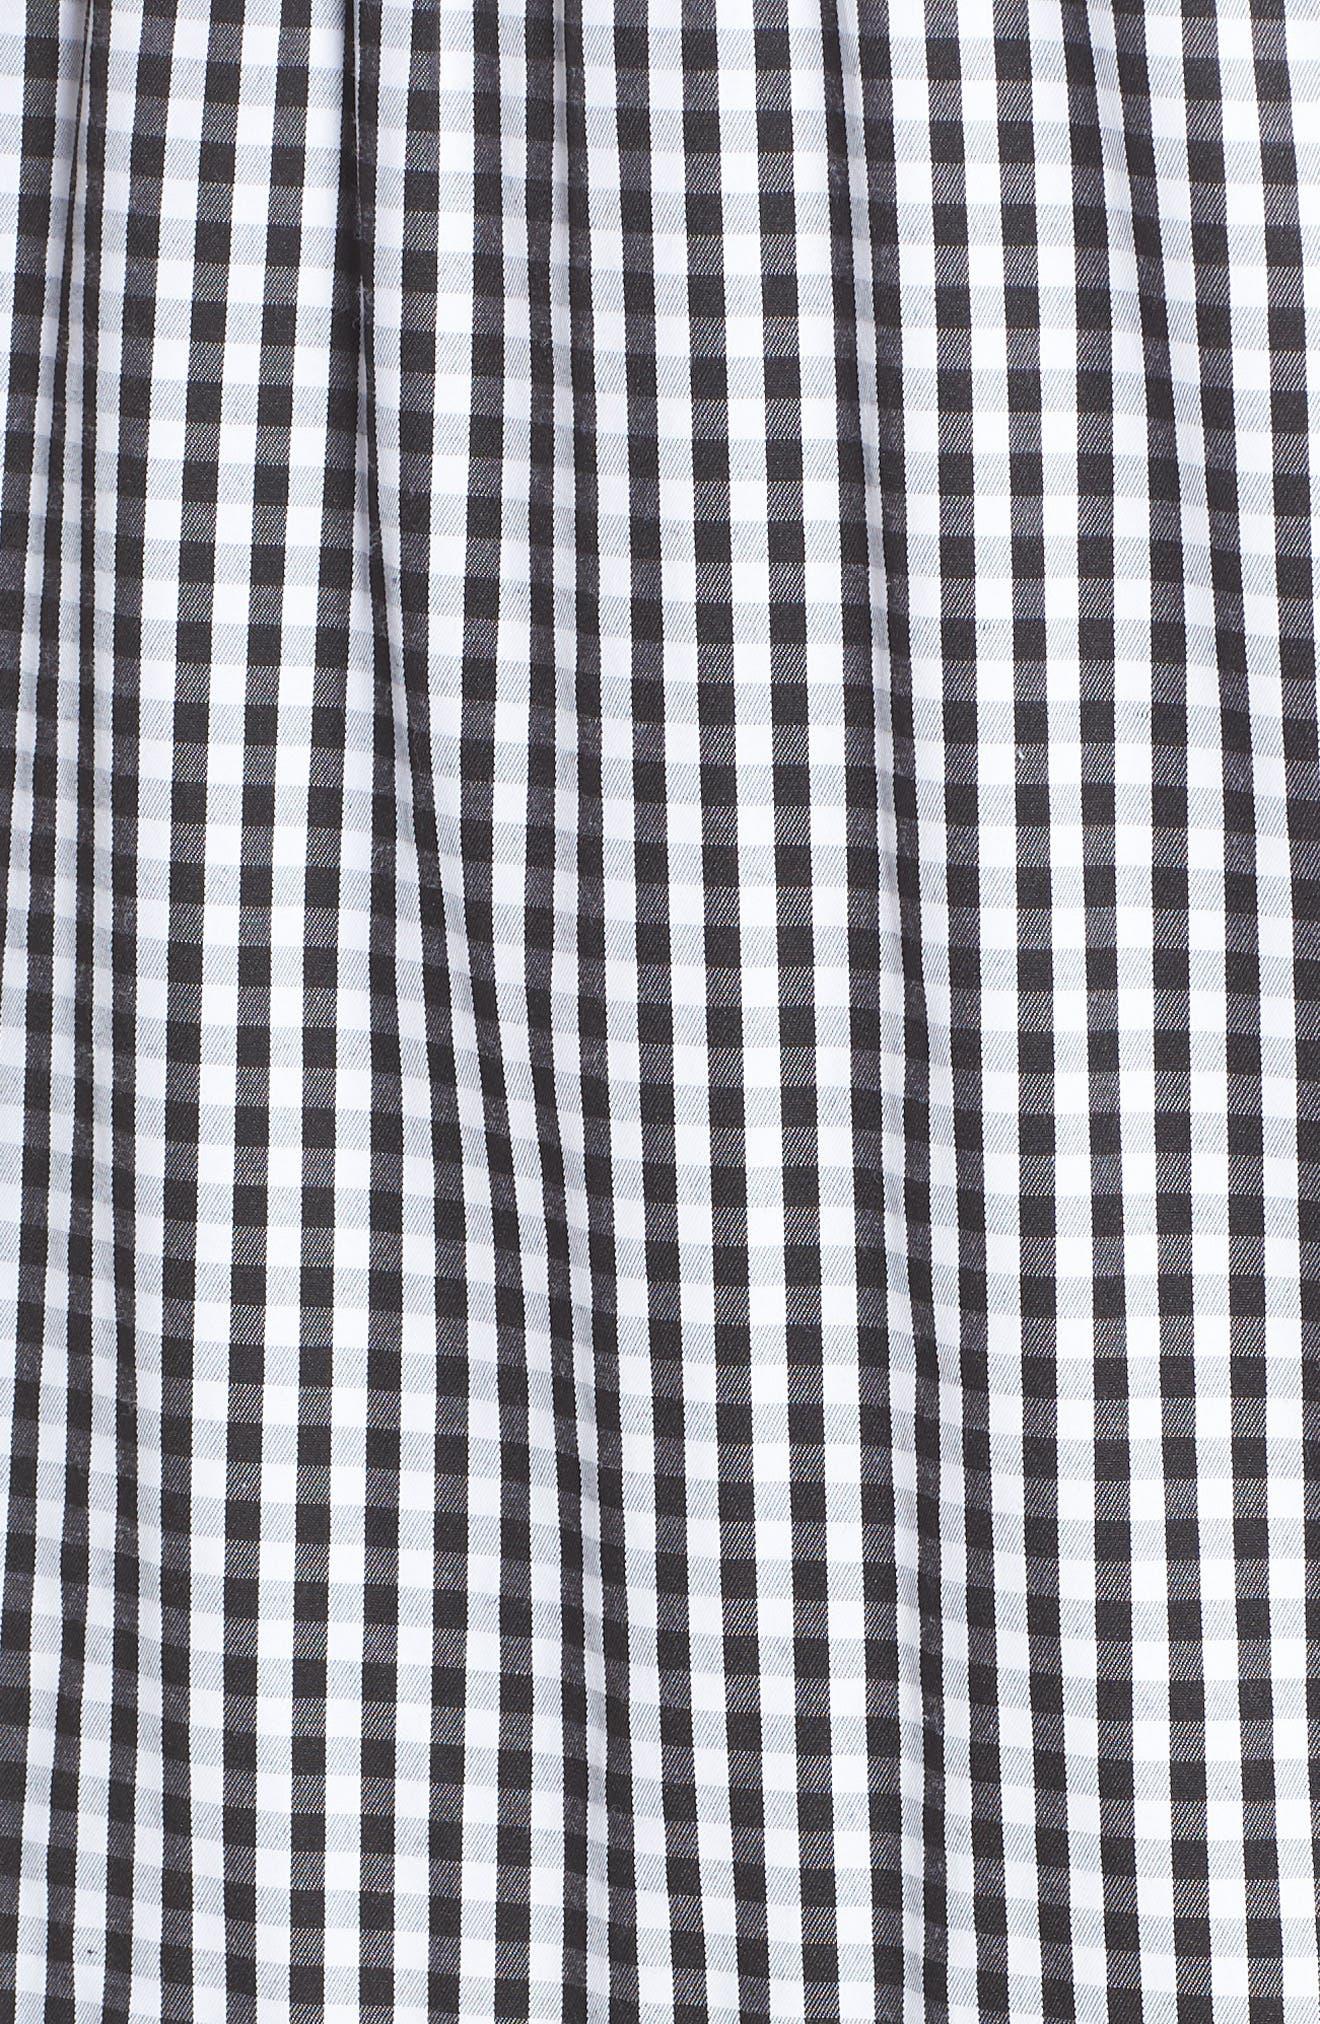 Gingham Check Maxi Dress,                             Alternate thumbnail 6, color,                             100